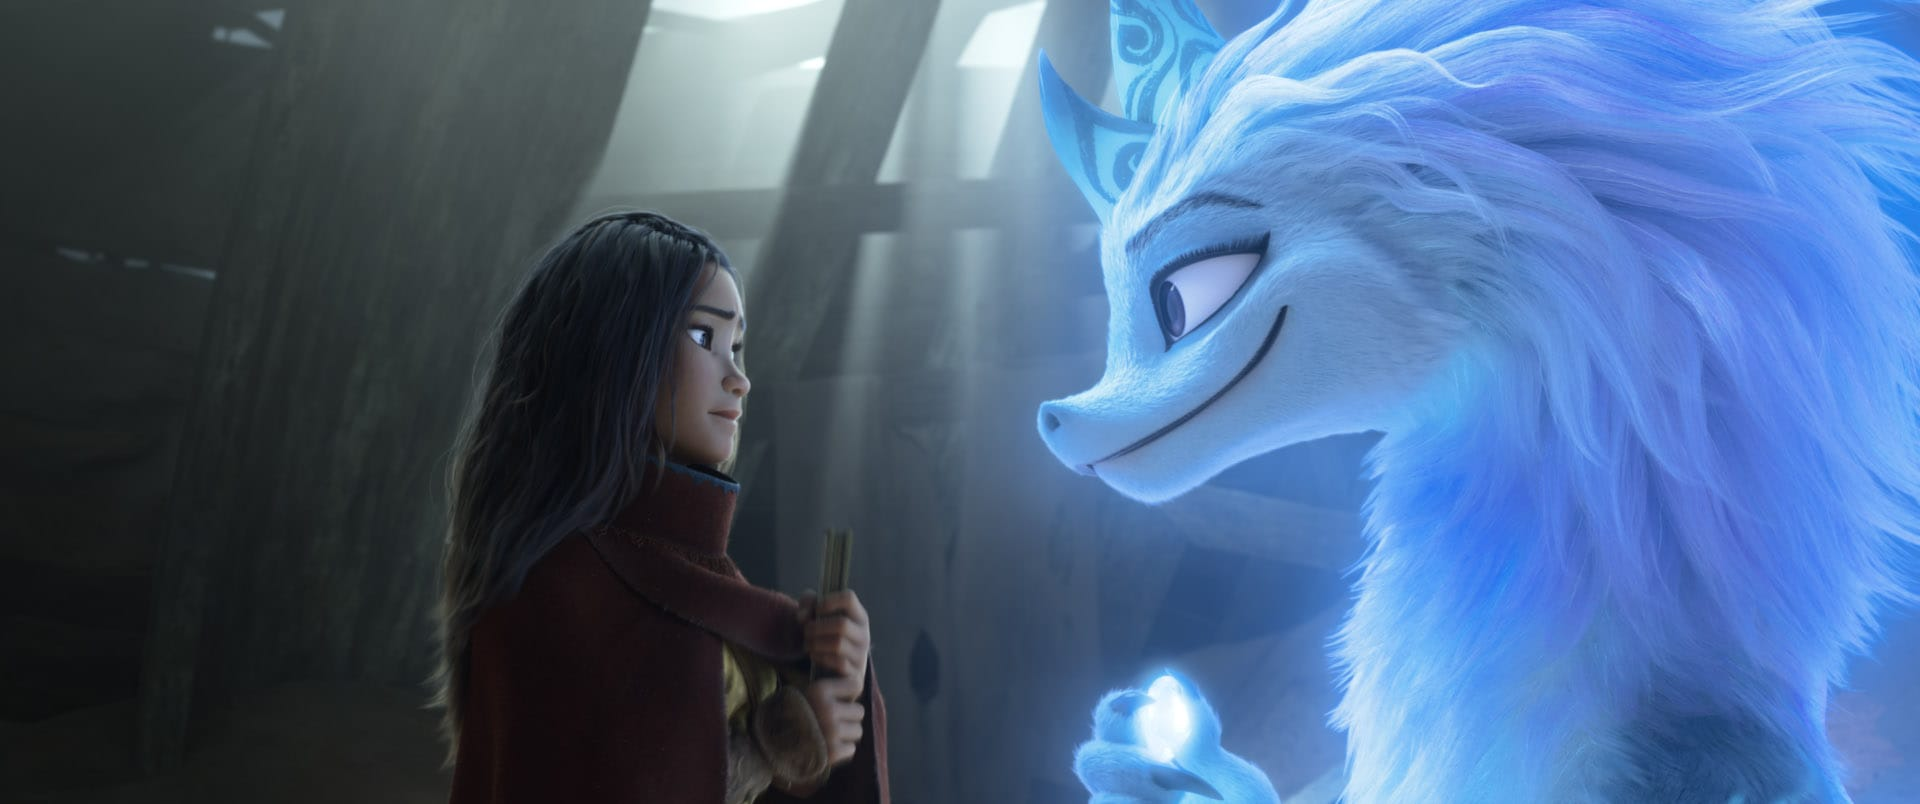 Raya et le dernier dragon (2021) de Don Hall et Carlos López Estrada photo film cinéma